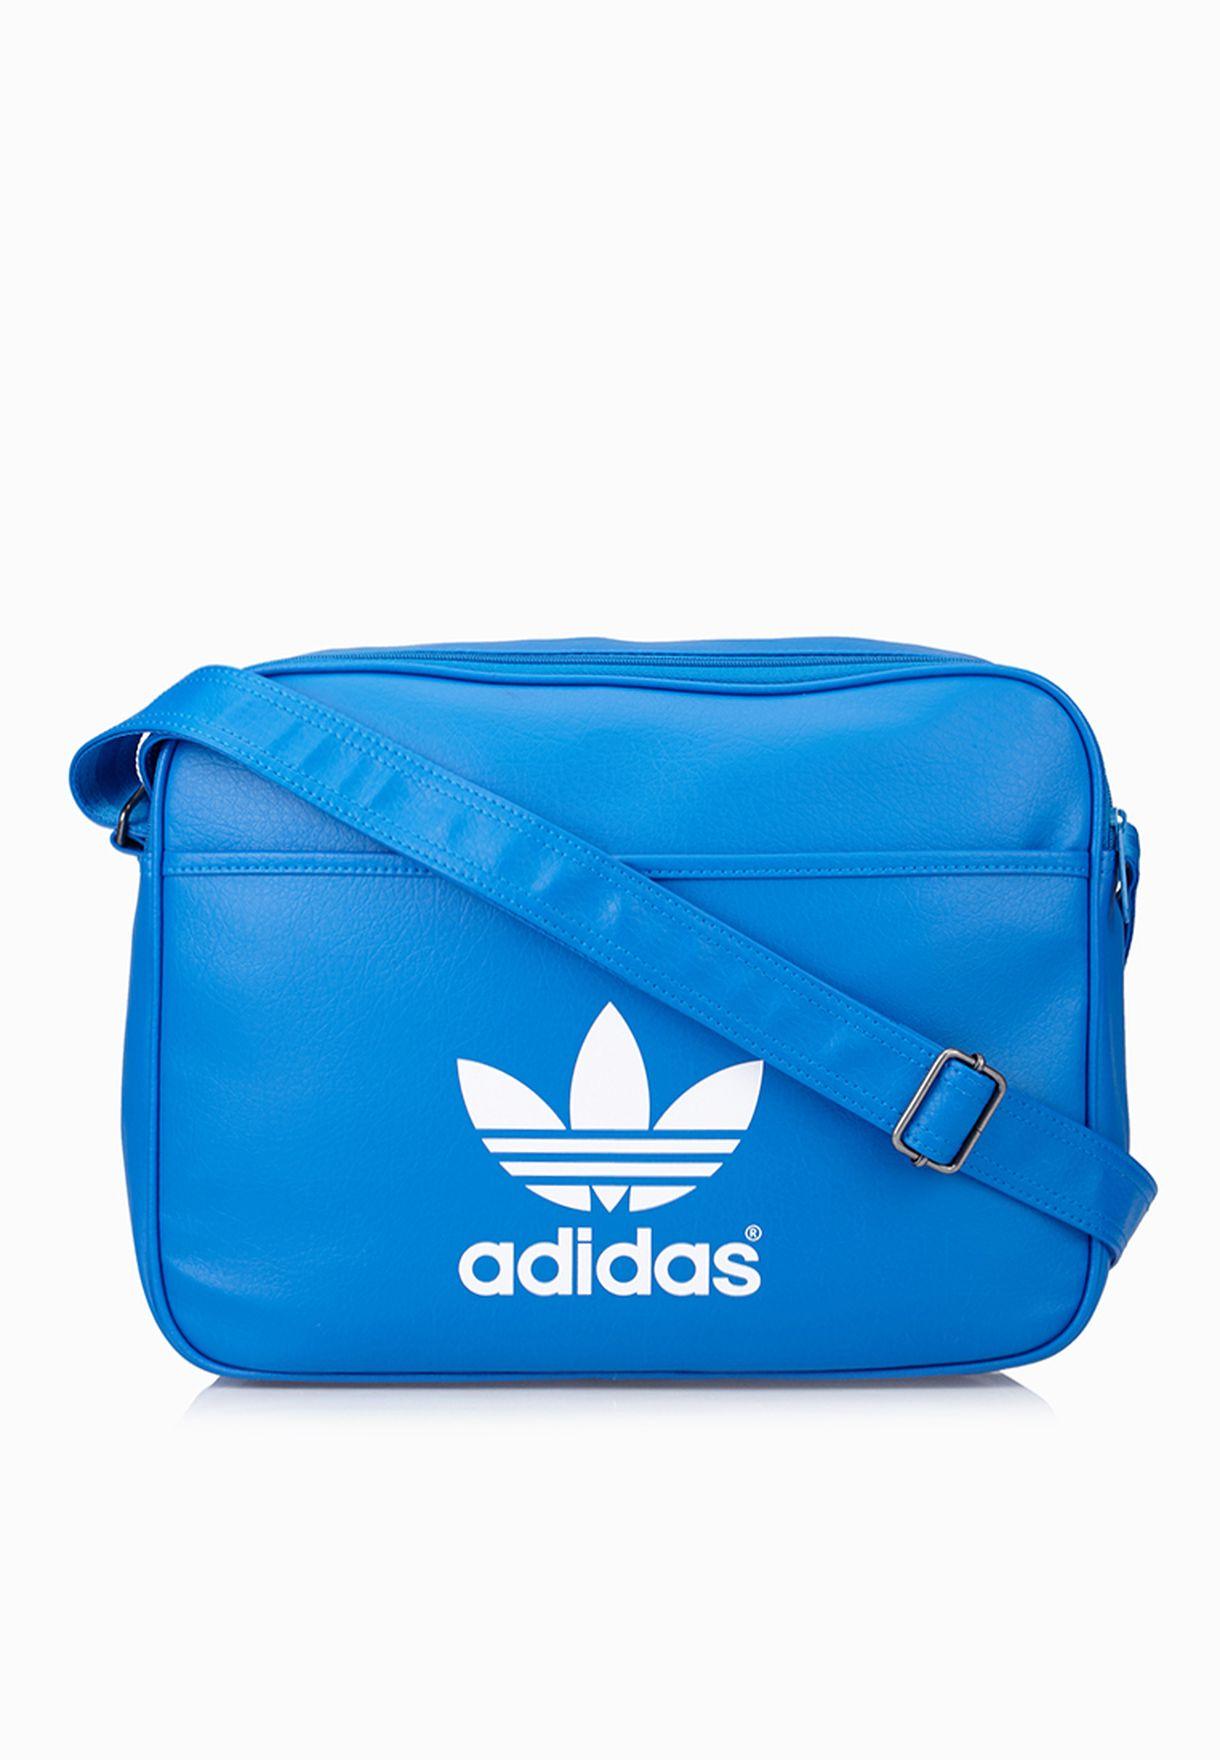 a32f6be018f9 Shop adidas Originals blue Airliner Classic Messenger AB2708 for Men ...